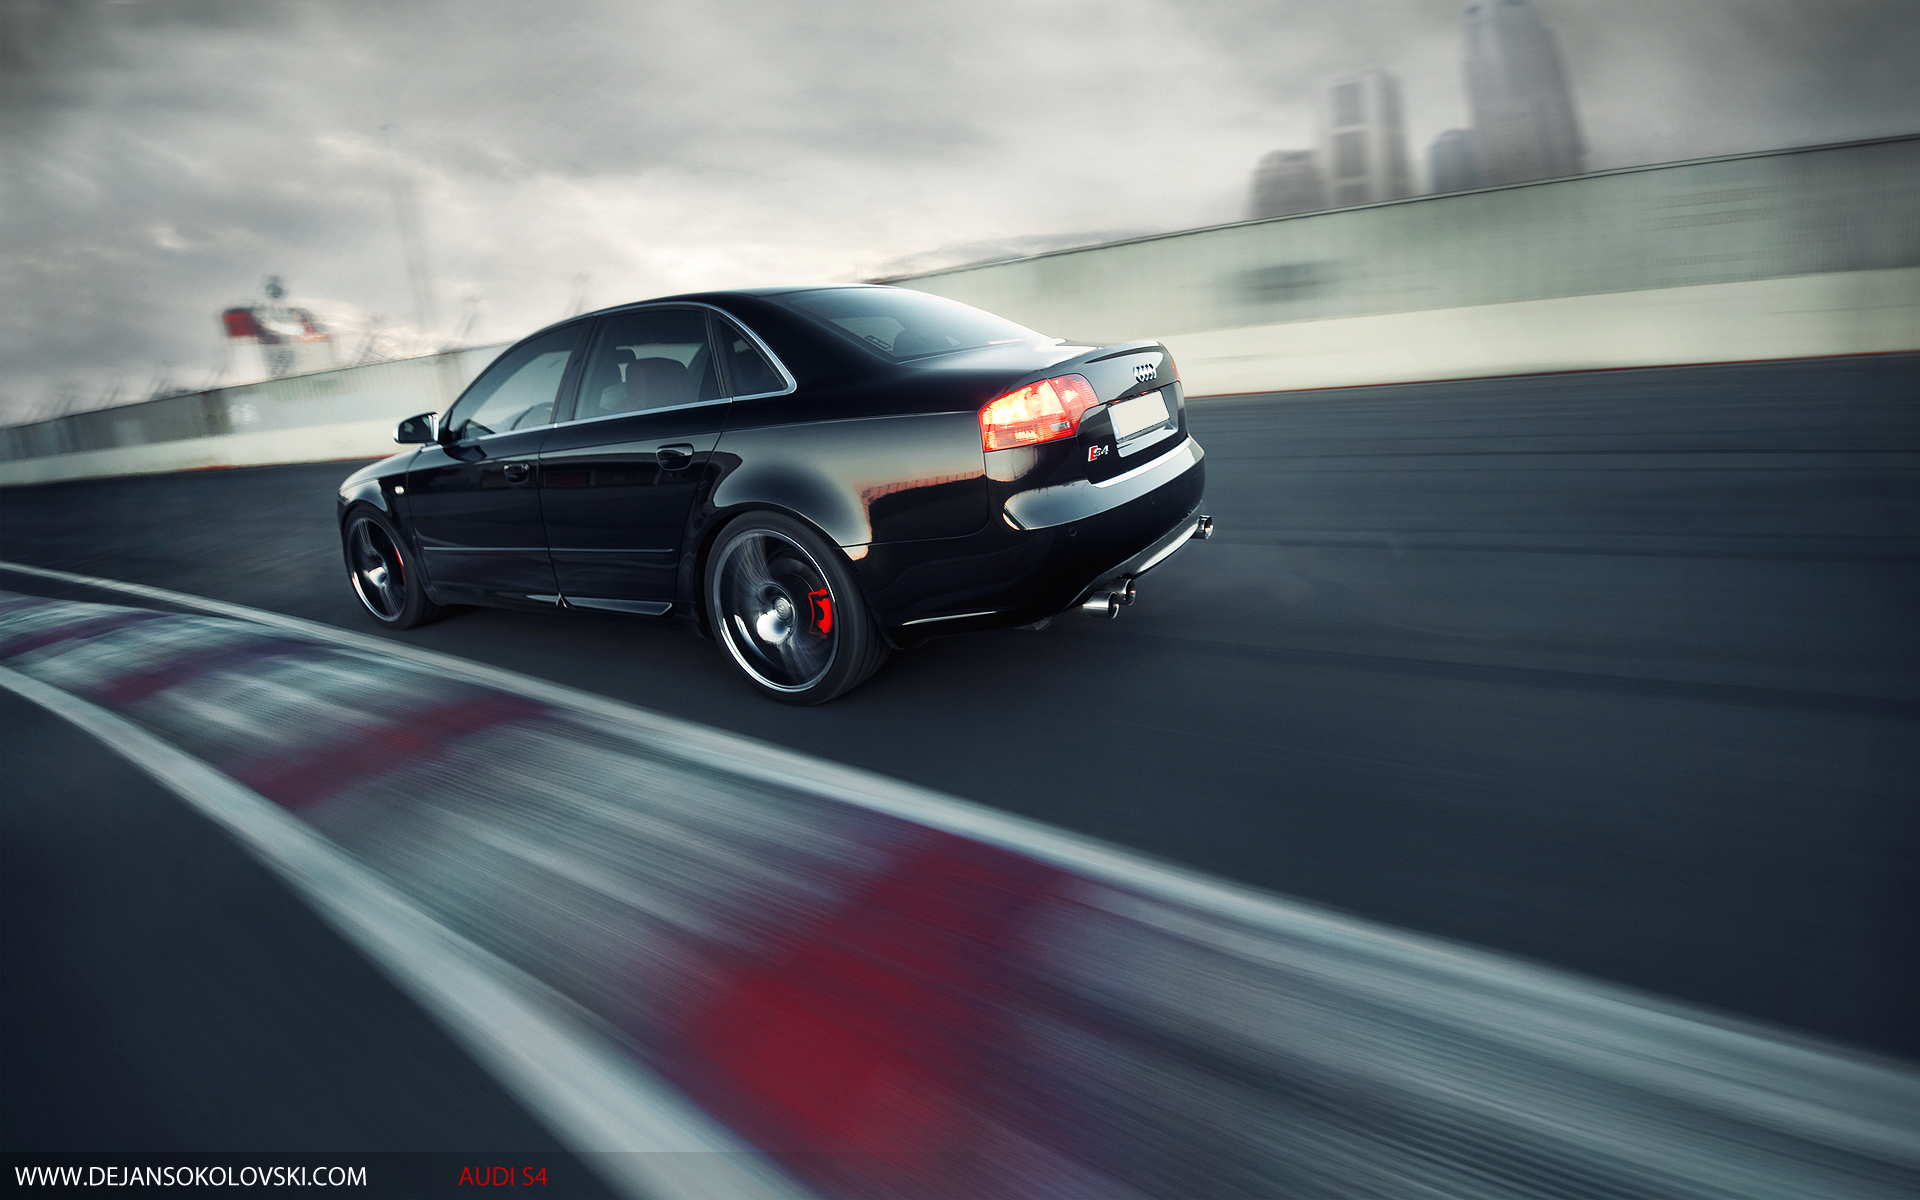 cars audi backview german s4 rs4 HD Wallpaper 1920x1200